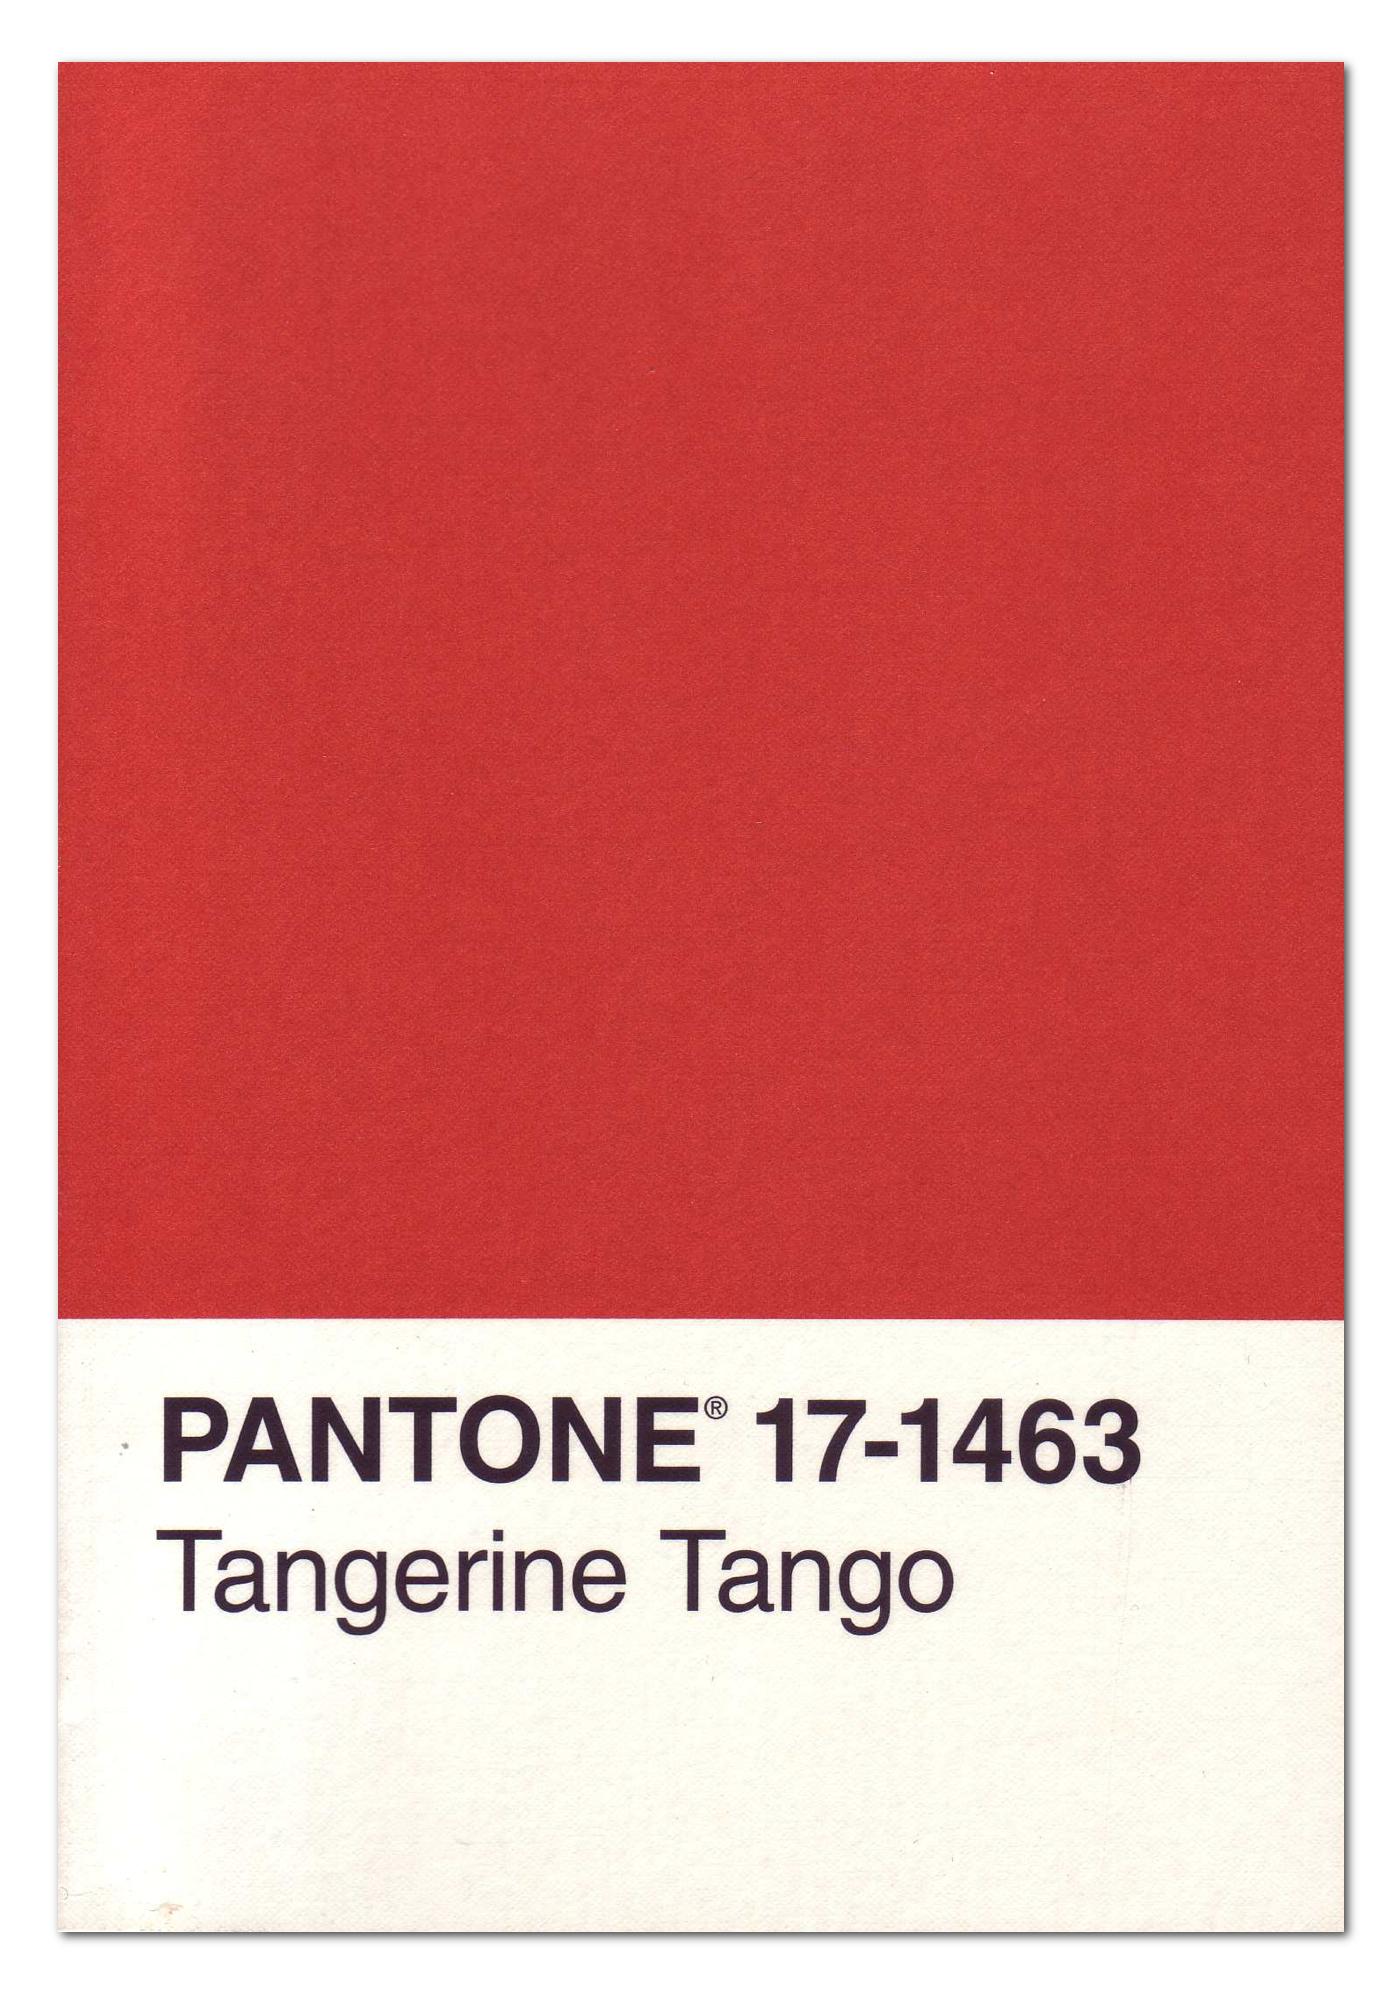 1400x2000 Buy Pantone Journal Tangerine Tango